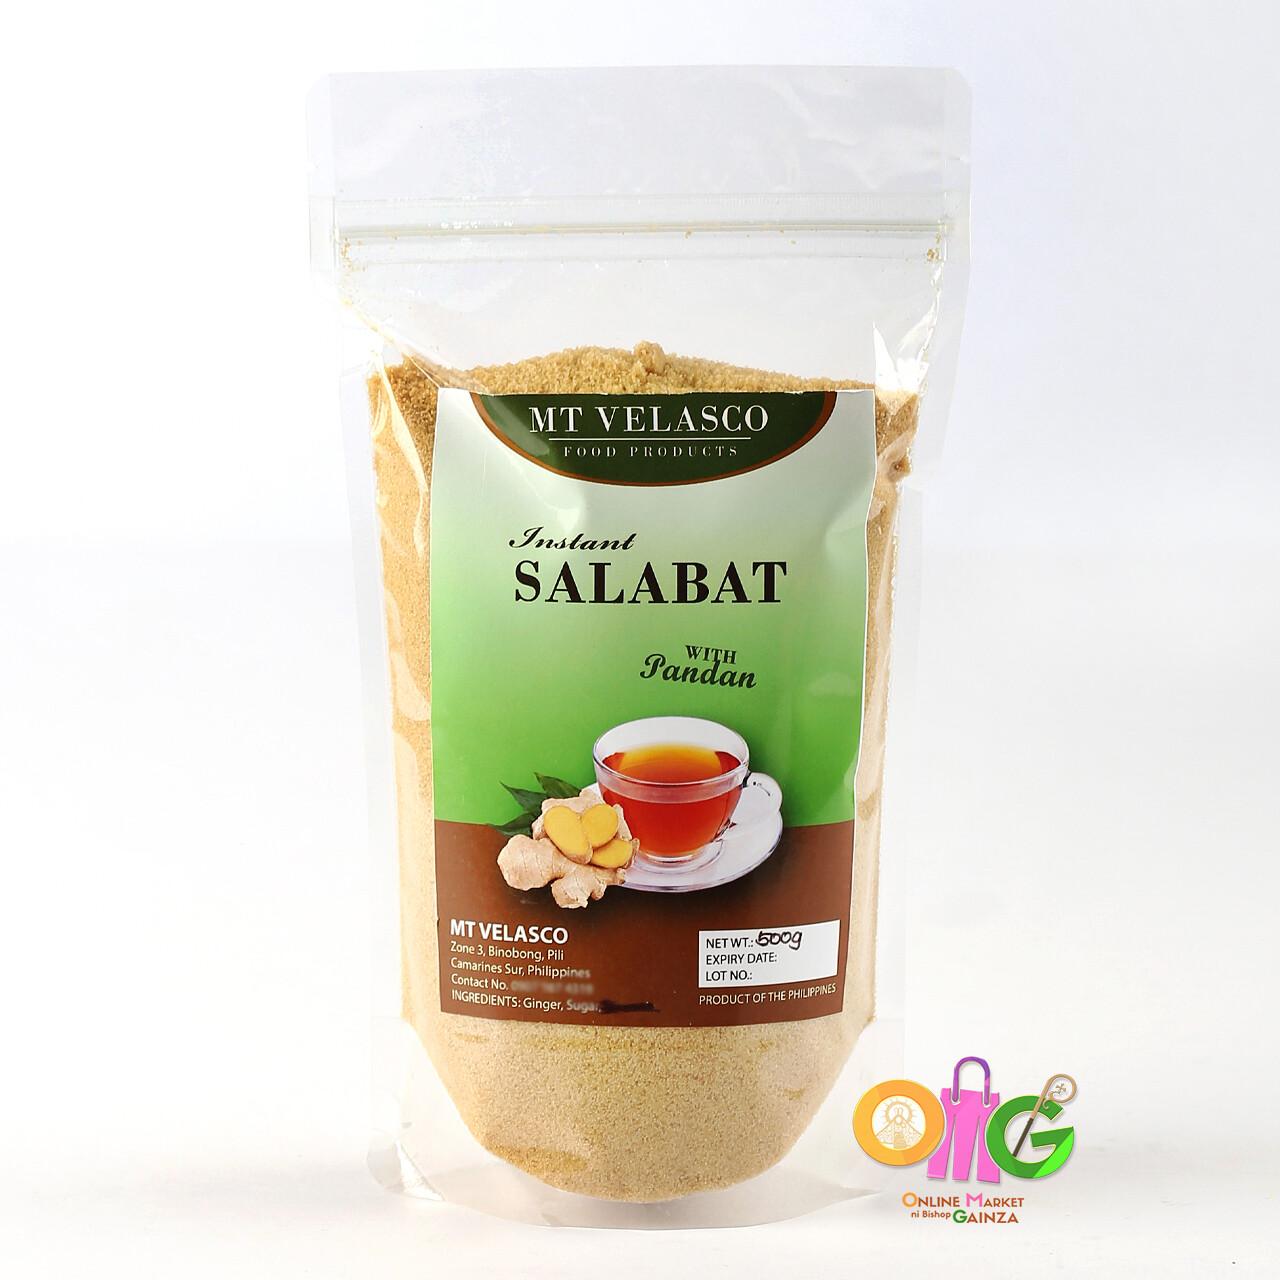 MT Velasco Food Products - Instant Salabat with Pandan